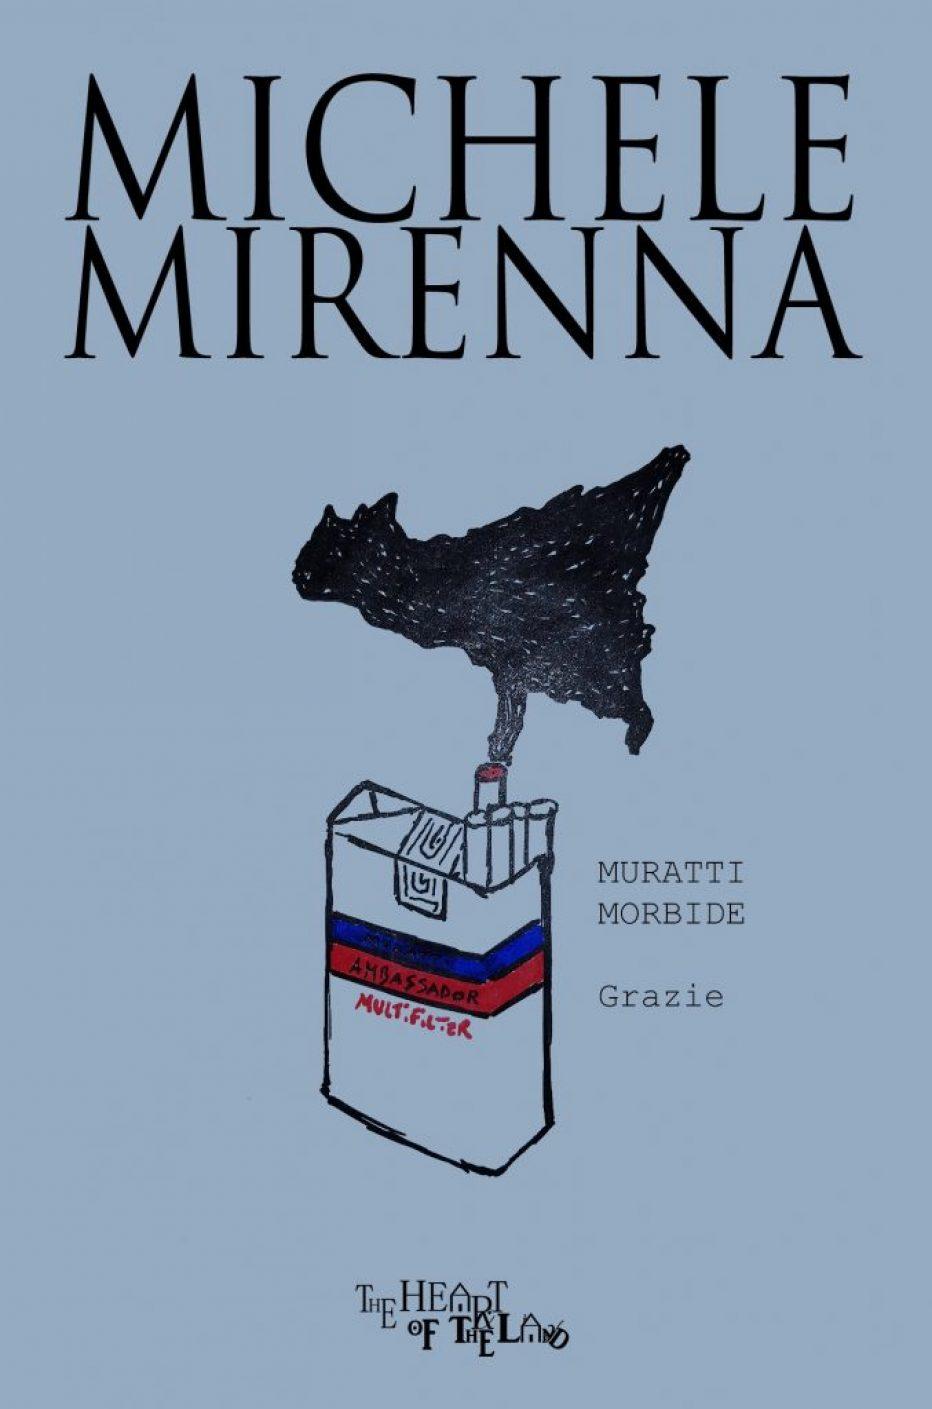 Muratti Morbide Grazie di  Michele Mirenna